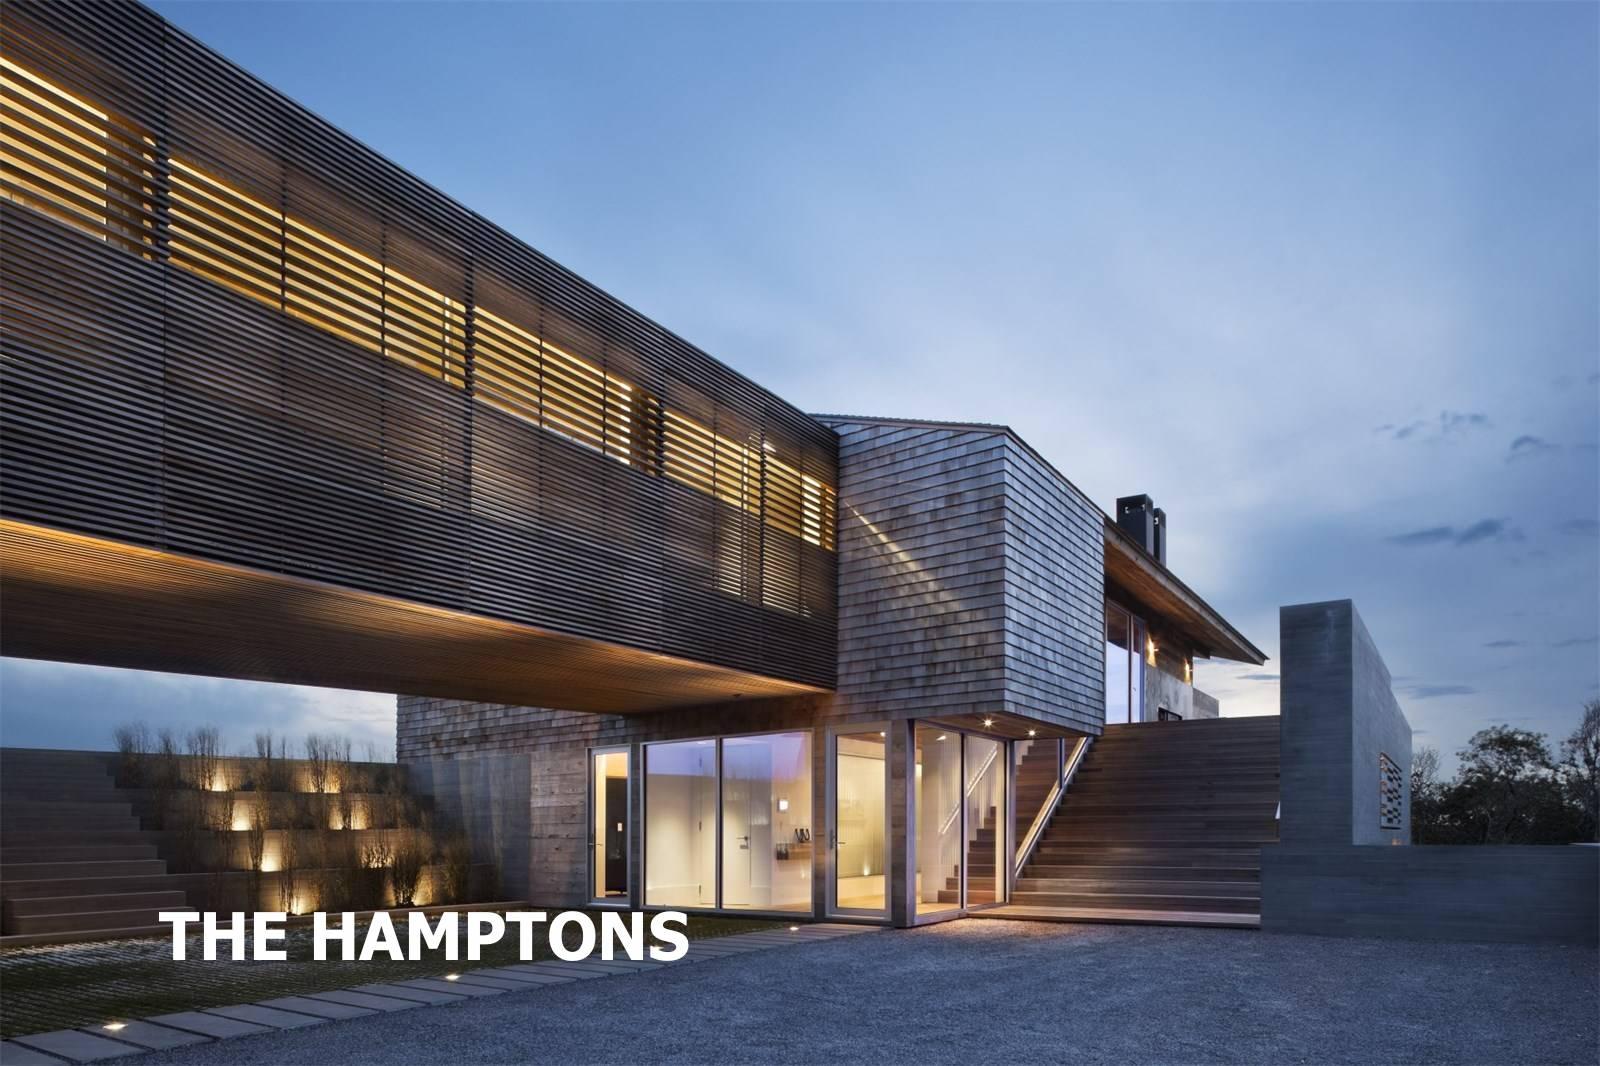 Montauk New York, The hamptons, Keller Hotels Luxury Vacation Rentals.jpeg